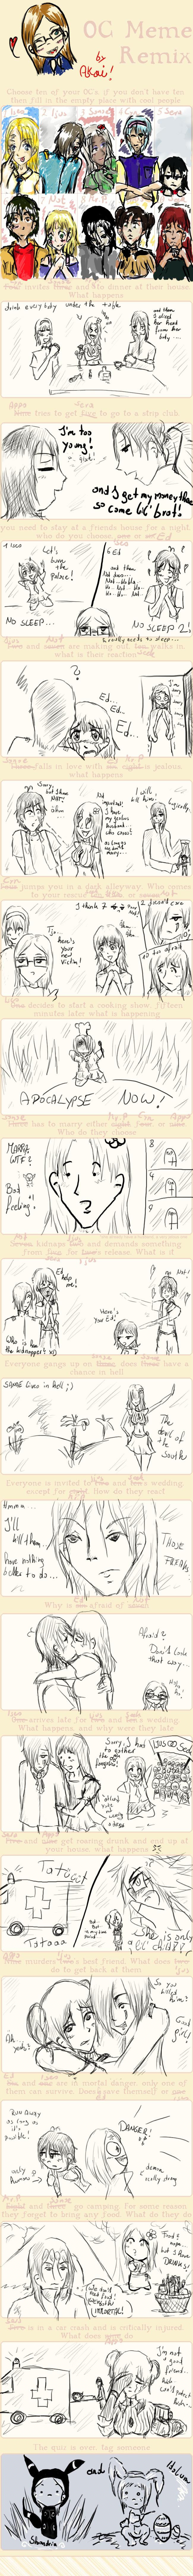 OC Meme by Akai